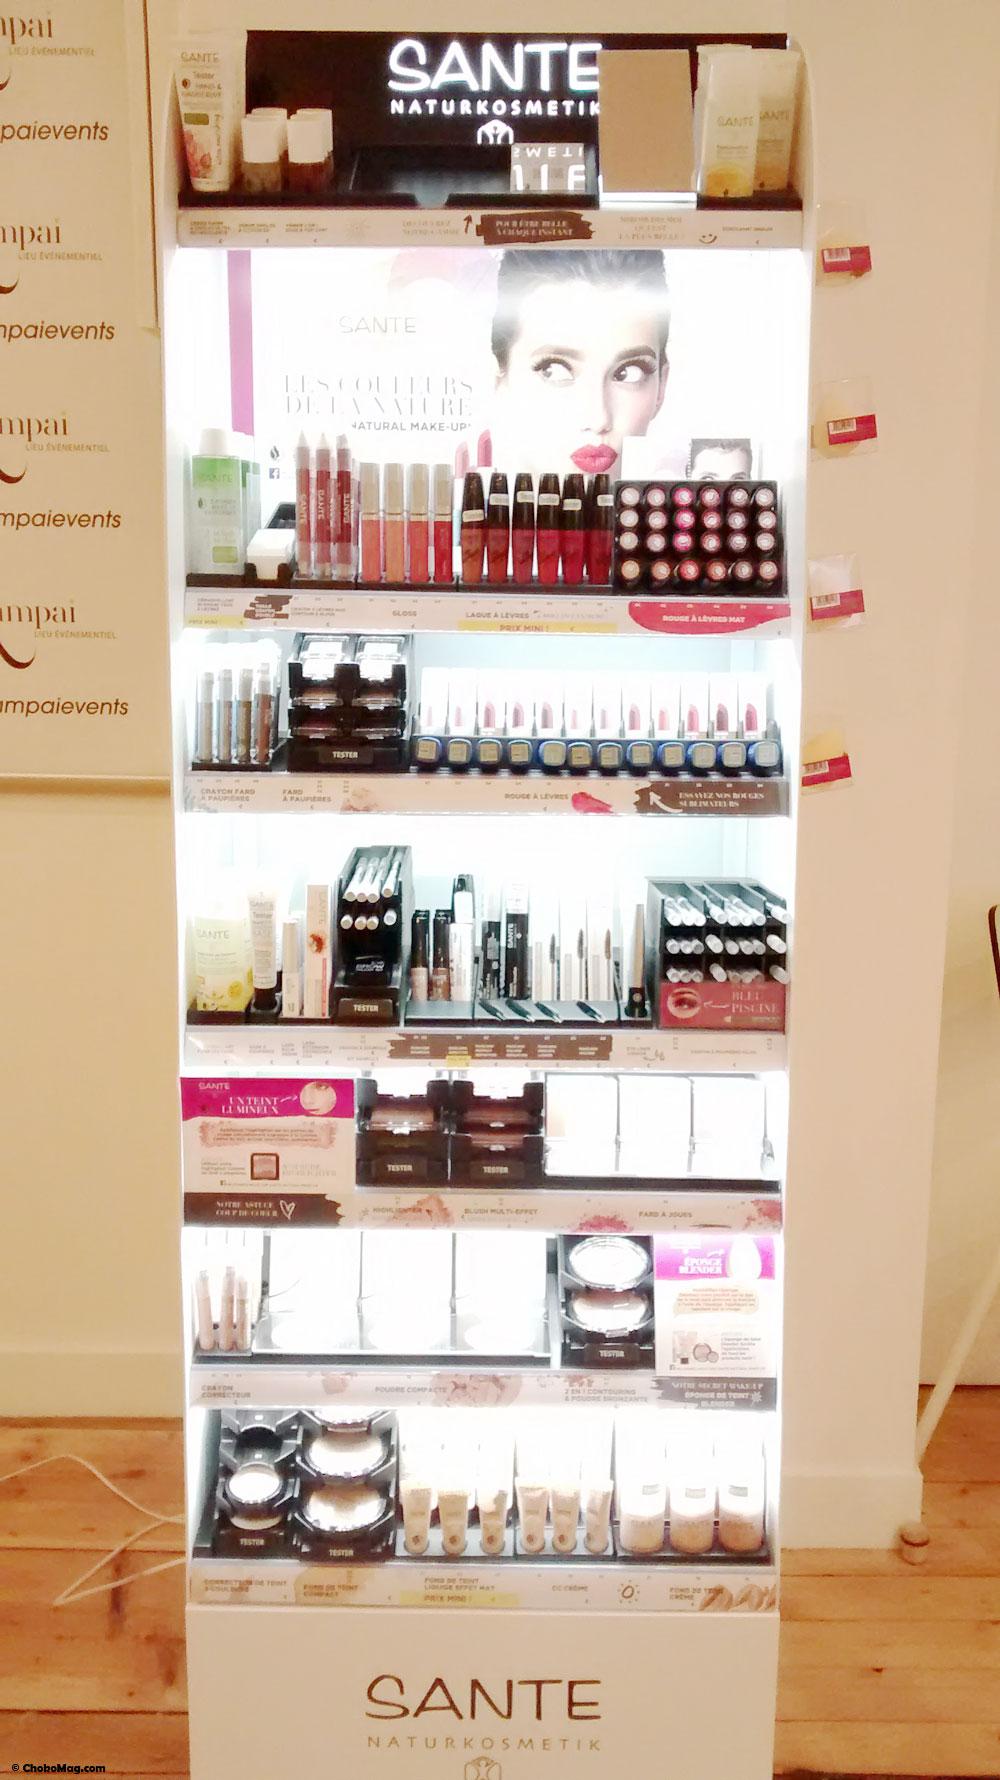 stand de présentation du maquillage bio sante naturkosmetik